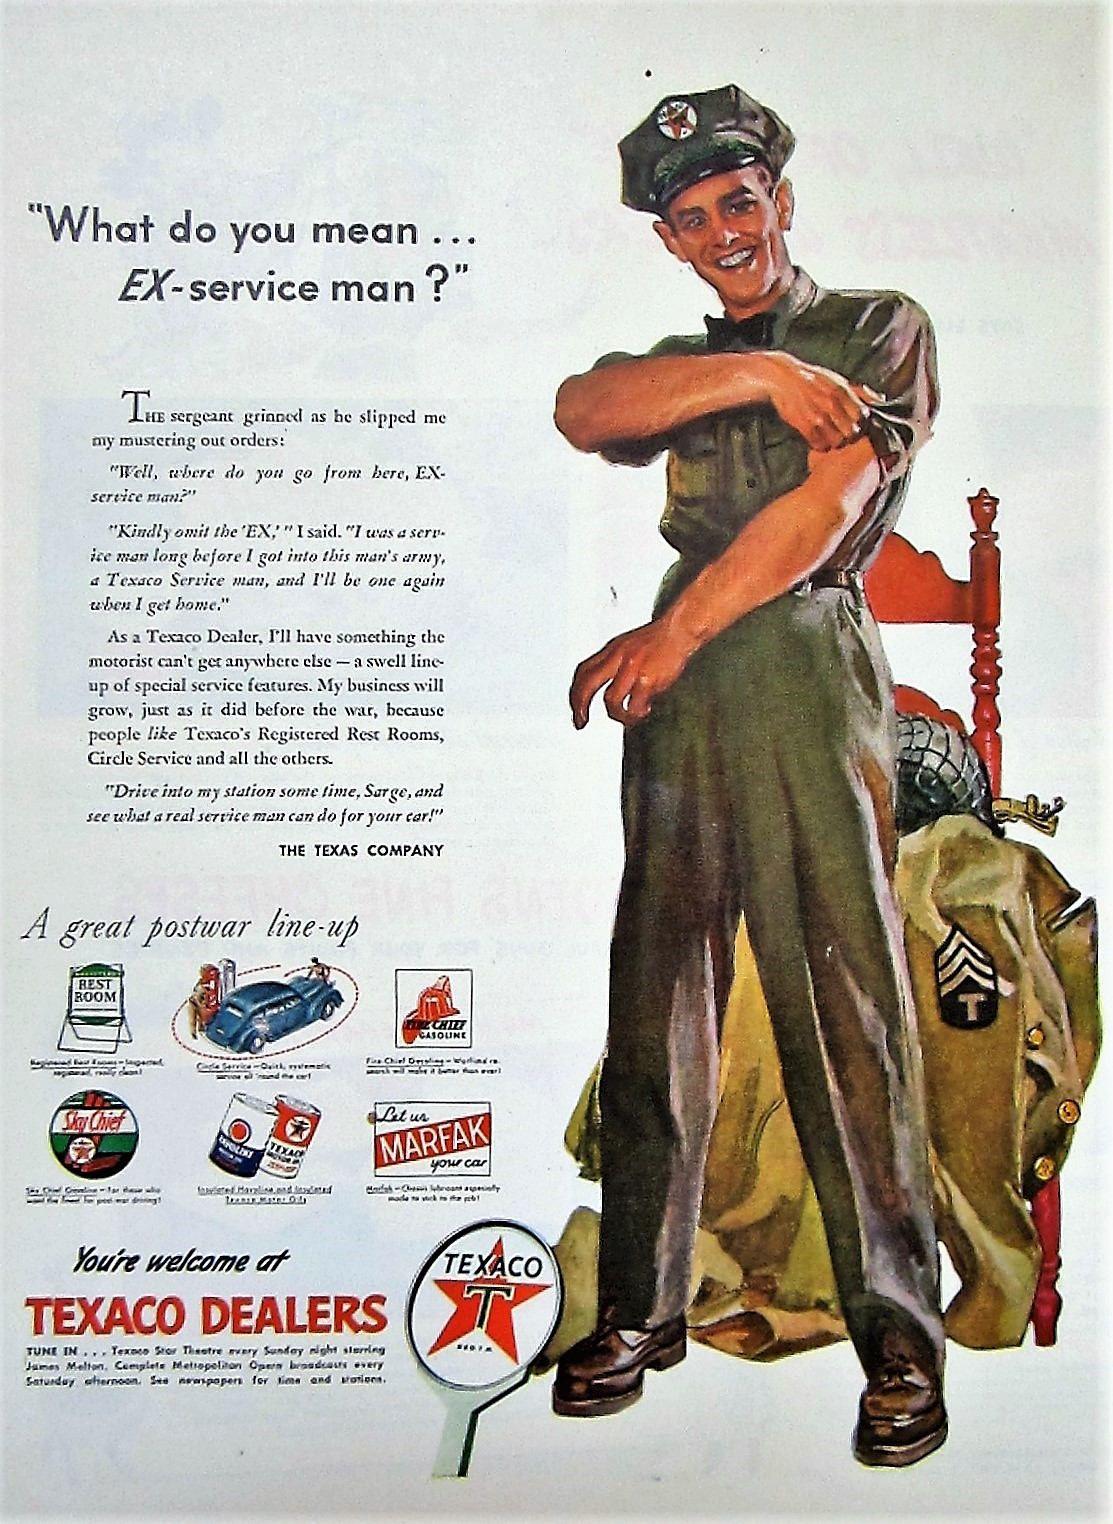 1945 Texaco Dealers Vintage Advertisement Gas Station Wall Art Man Cave Decor Automotive Print Original Magazine Ad WWII Military Ephemera